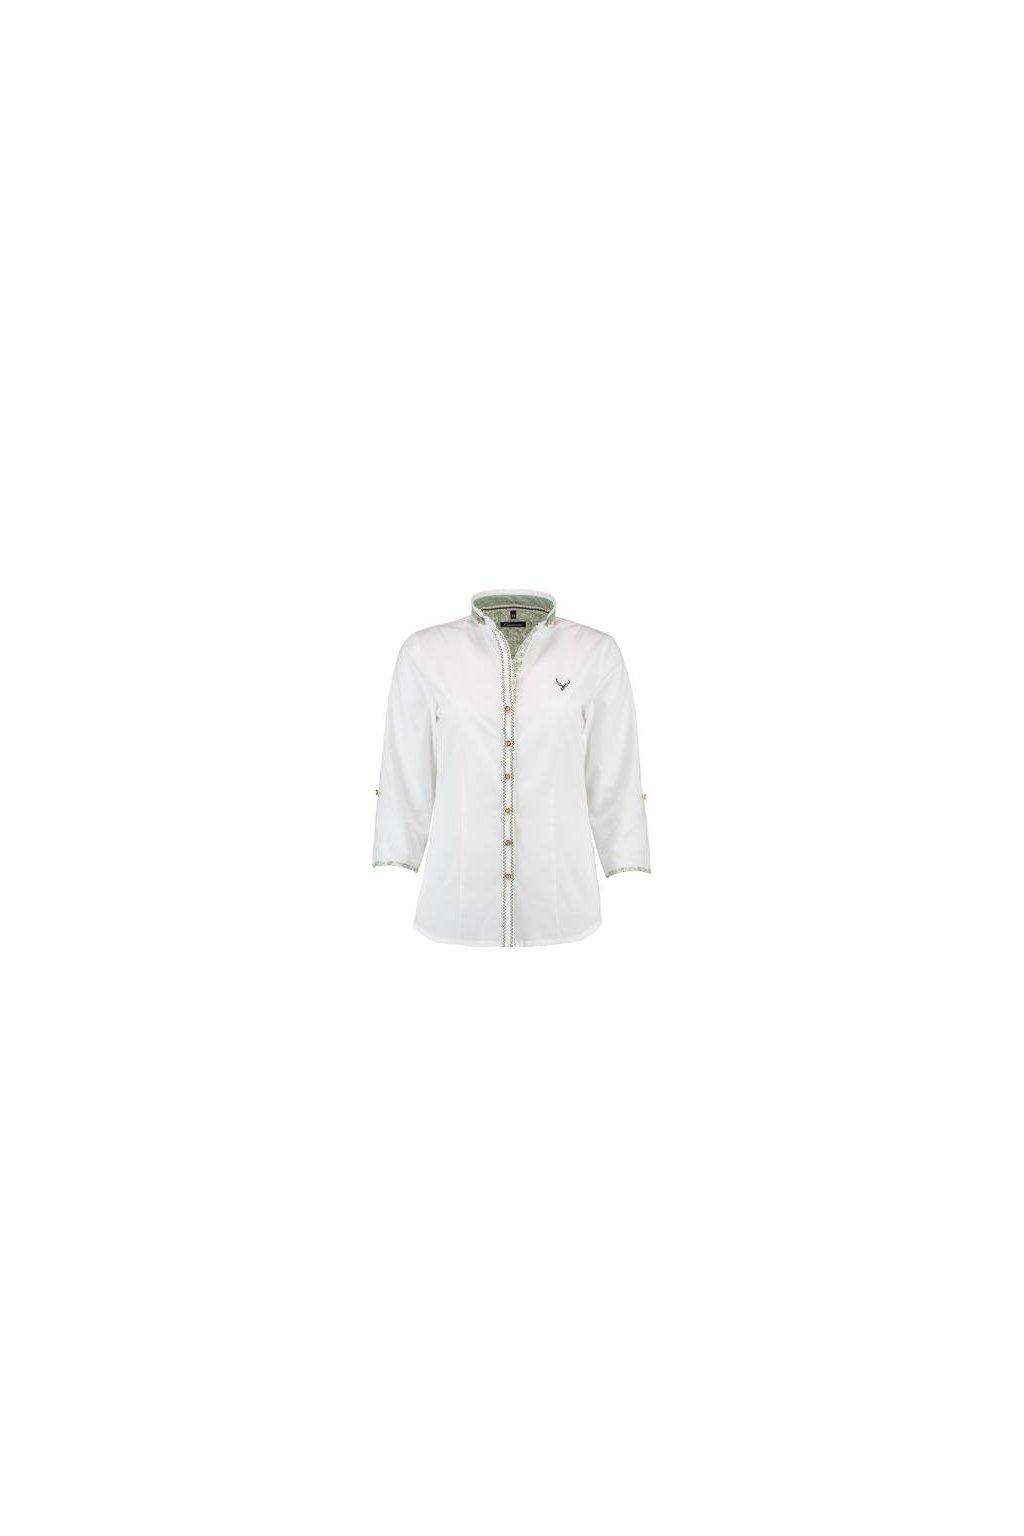 ORBIS - halenka dámská bílá se stojáčkem (2683)